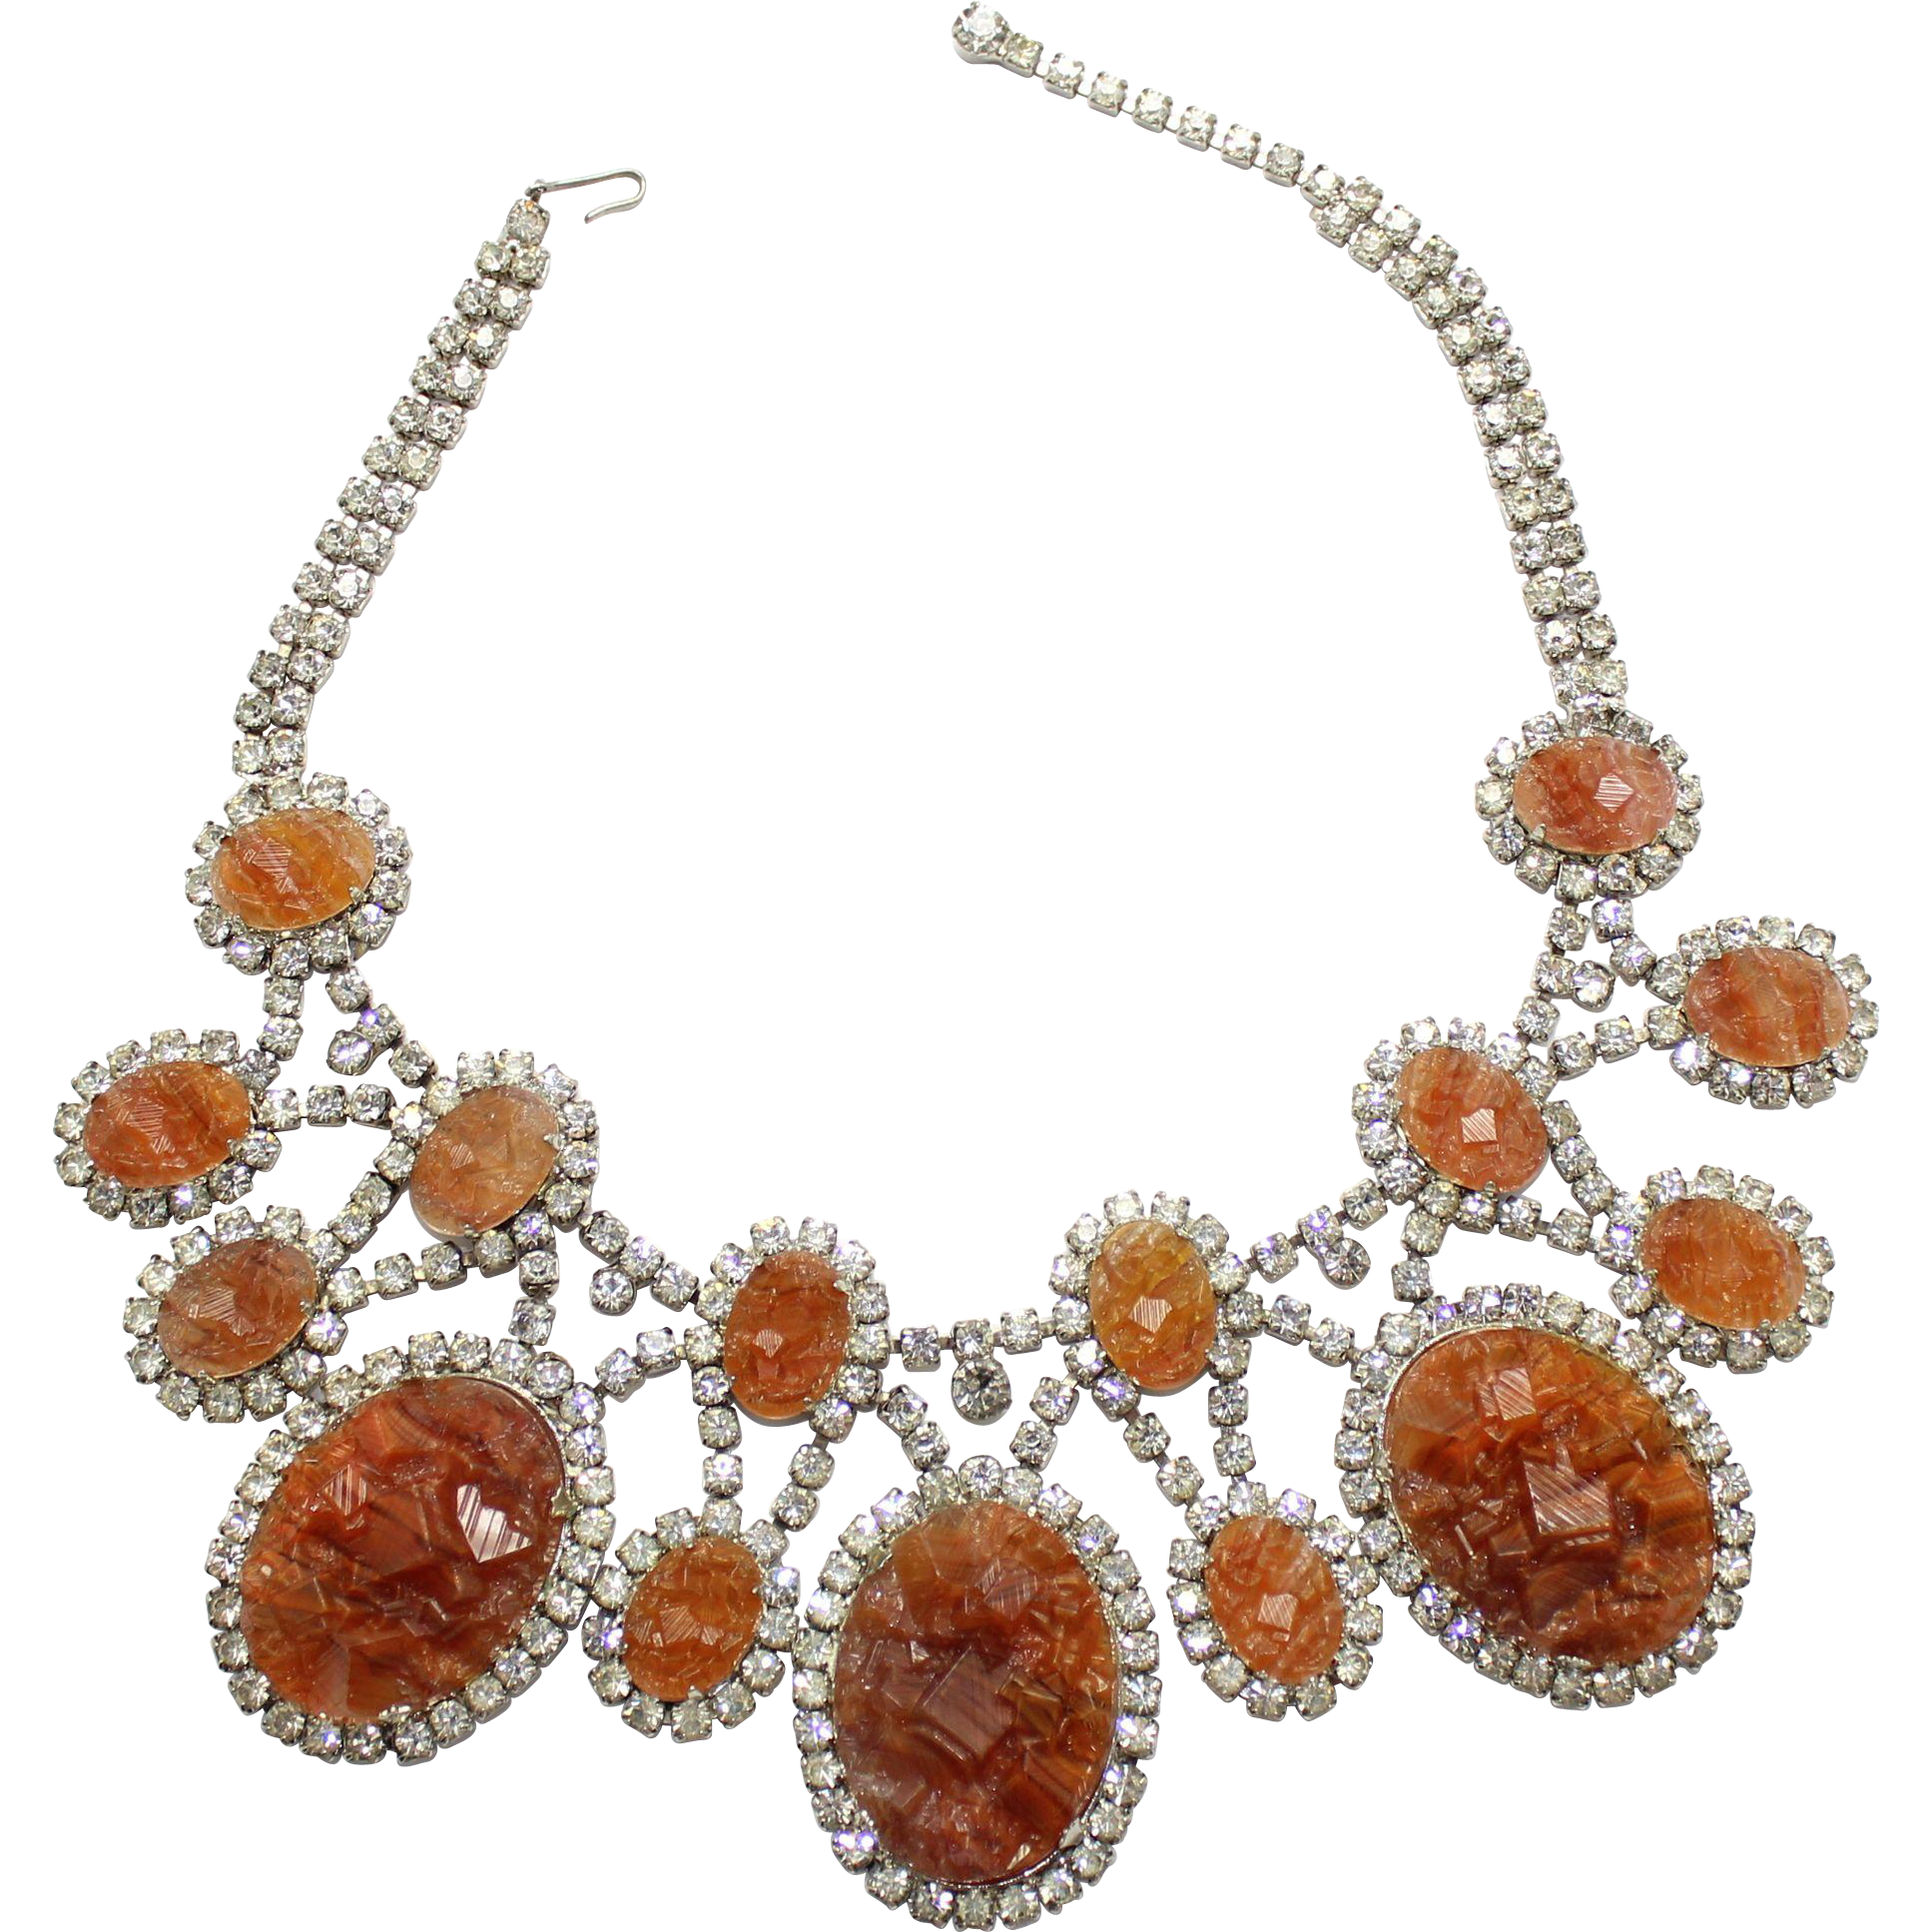 Vintage Juliana for KJL Book Piece Topaz Geode Clear Rhinestone Bib Necklace